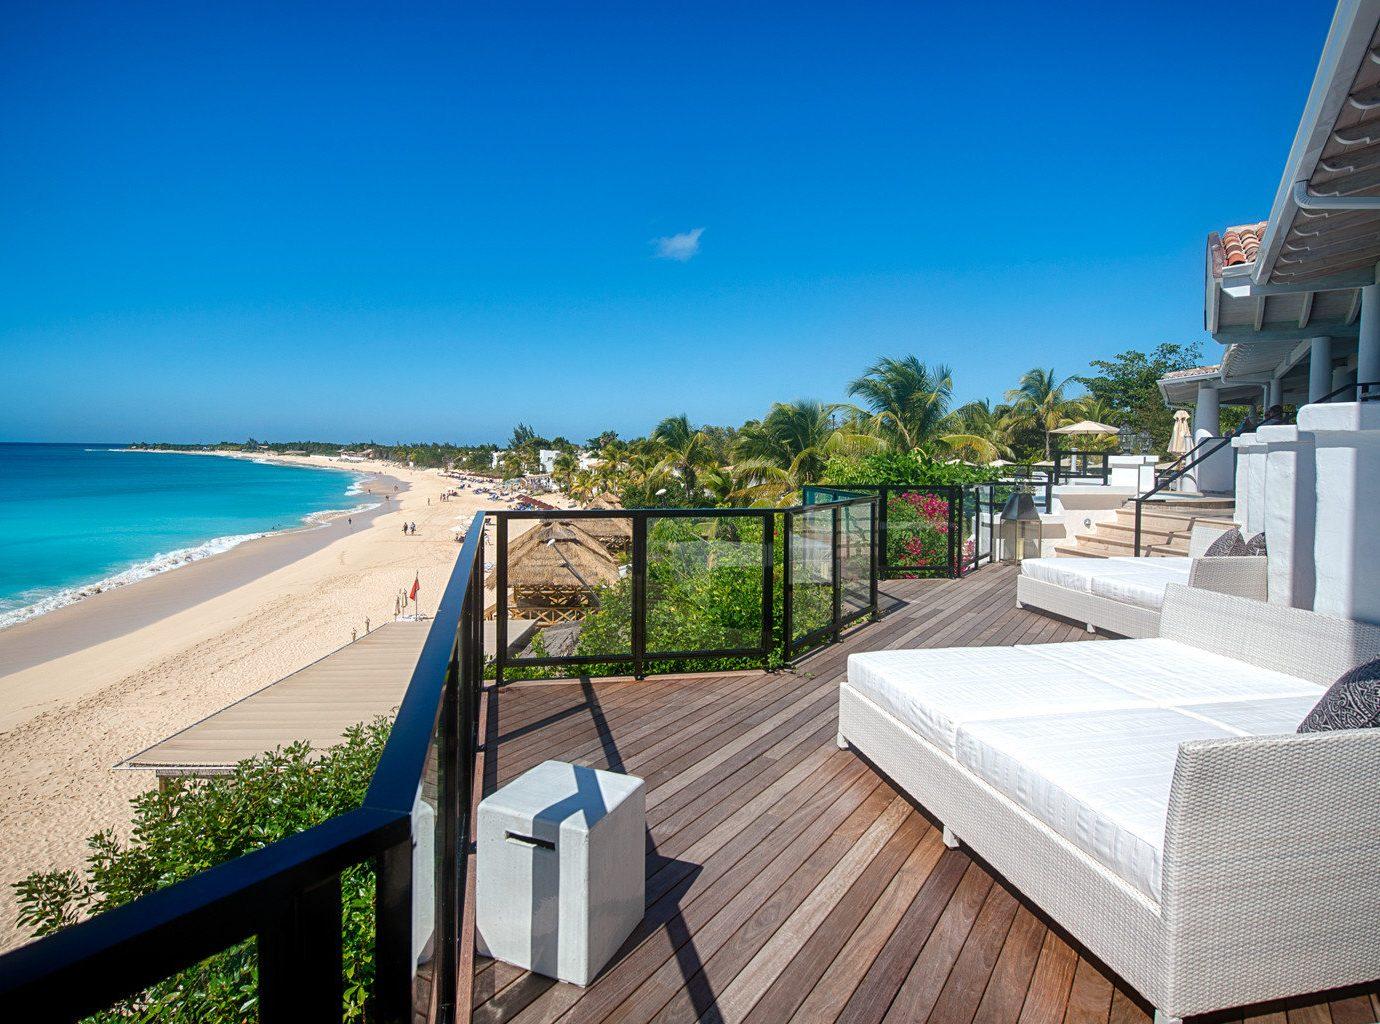 Beach Beachfront Family Hotels Luxury Play Resort Scenic views sky outdoor leisure vacation walkway Sea swimming pool estate overlooking Deck shore